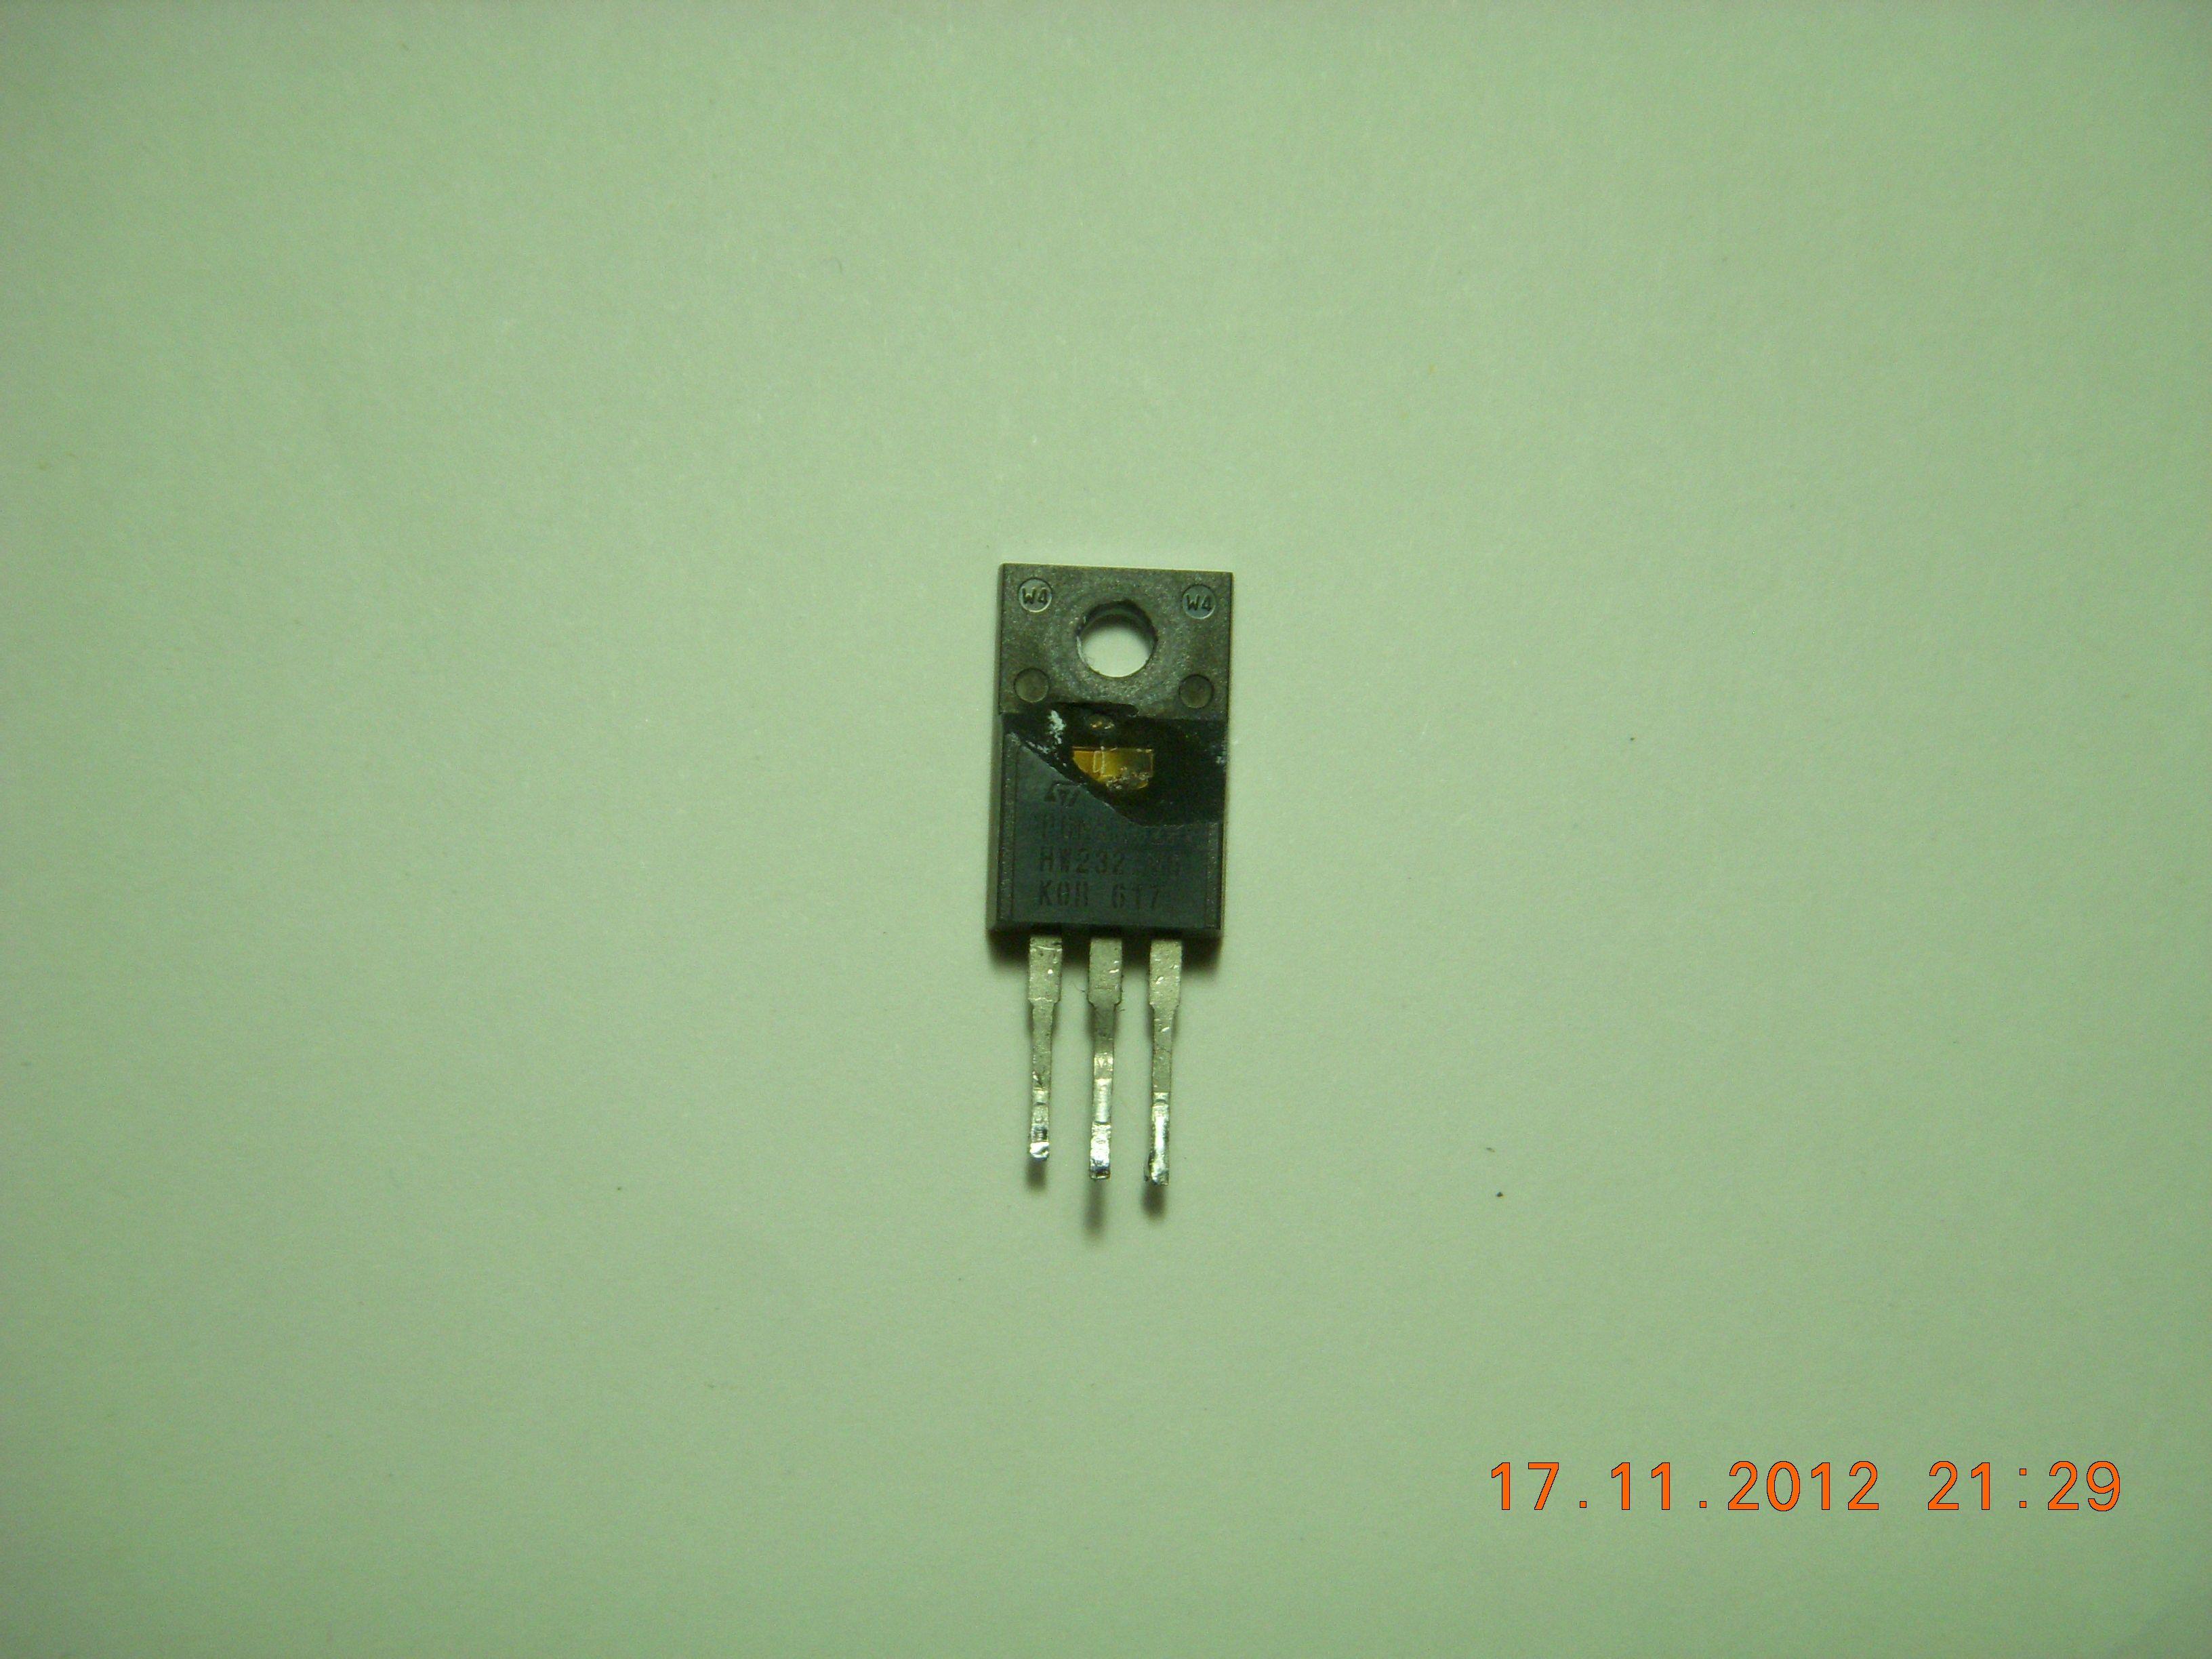 lc-32b15电路图,这是电源板的照片,请高手指点哪是整流桥,pfc电路mos